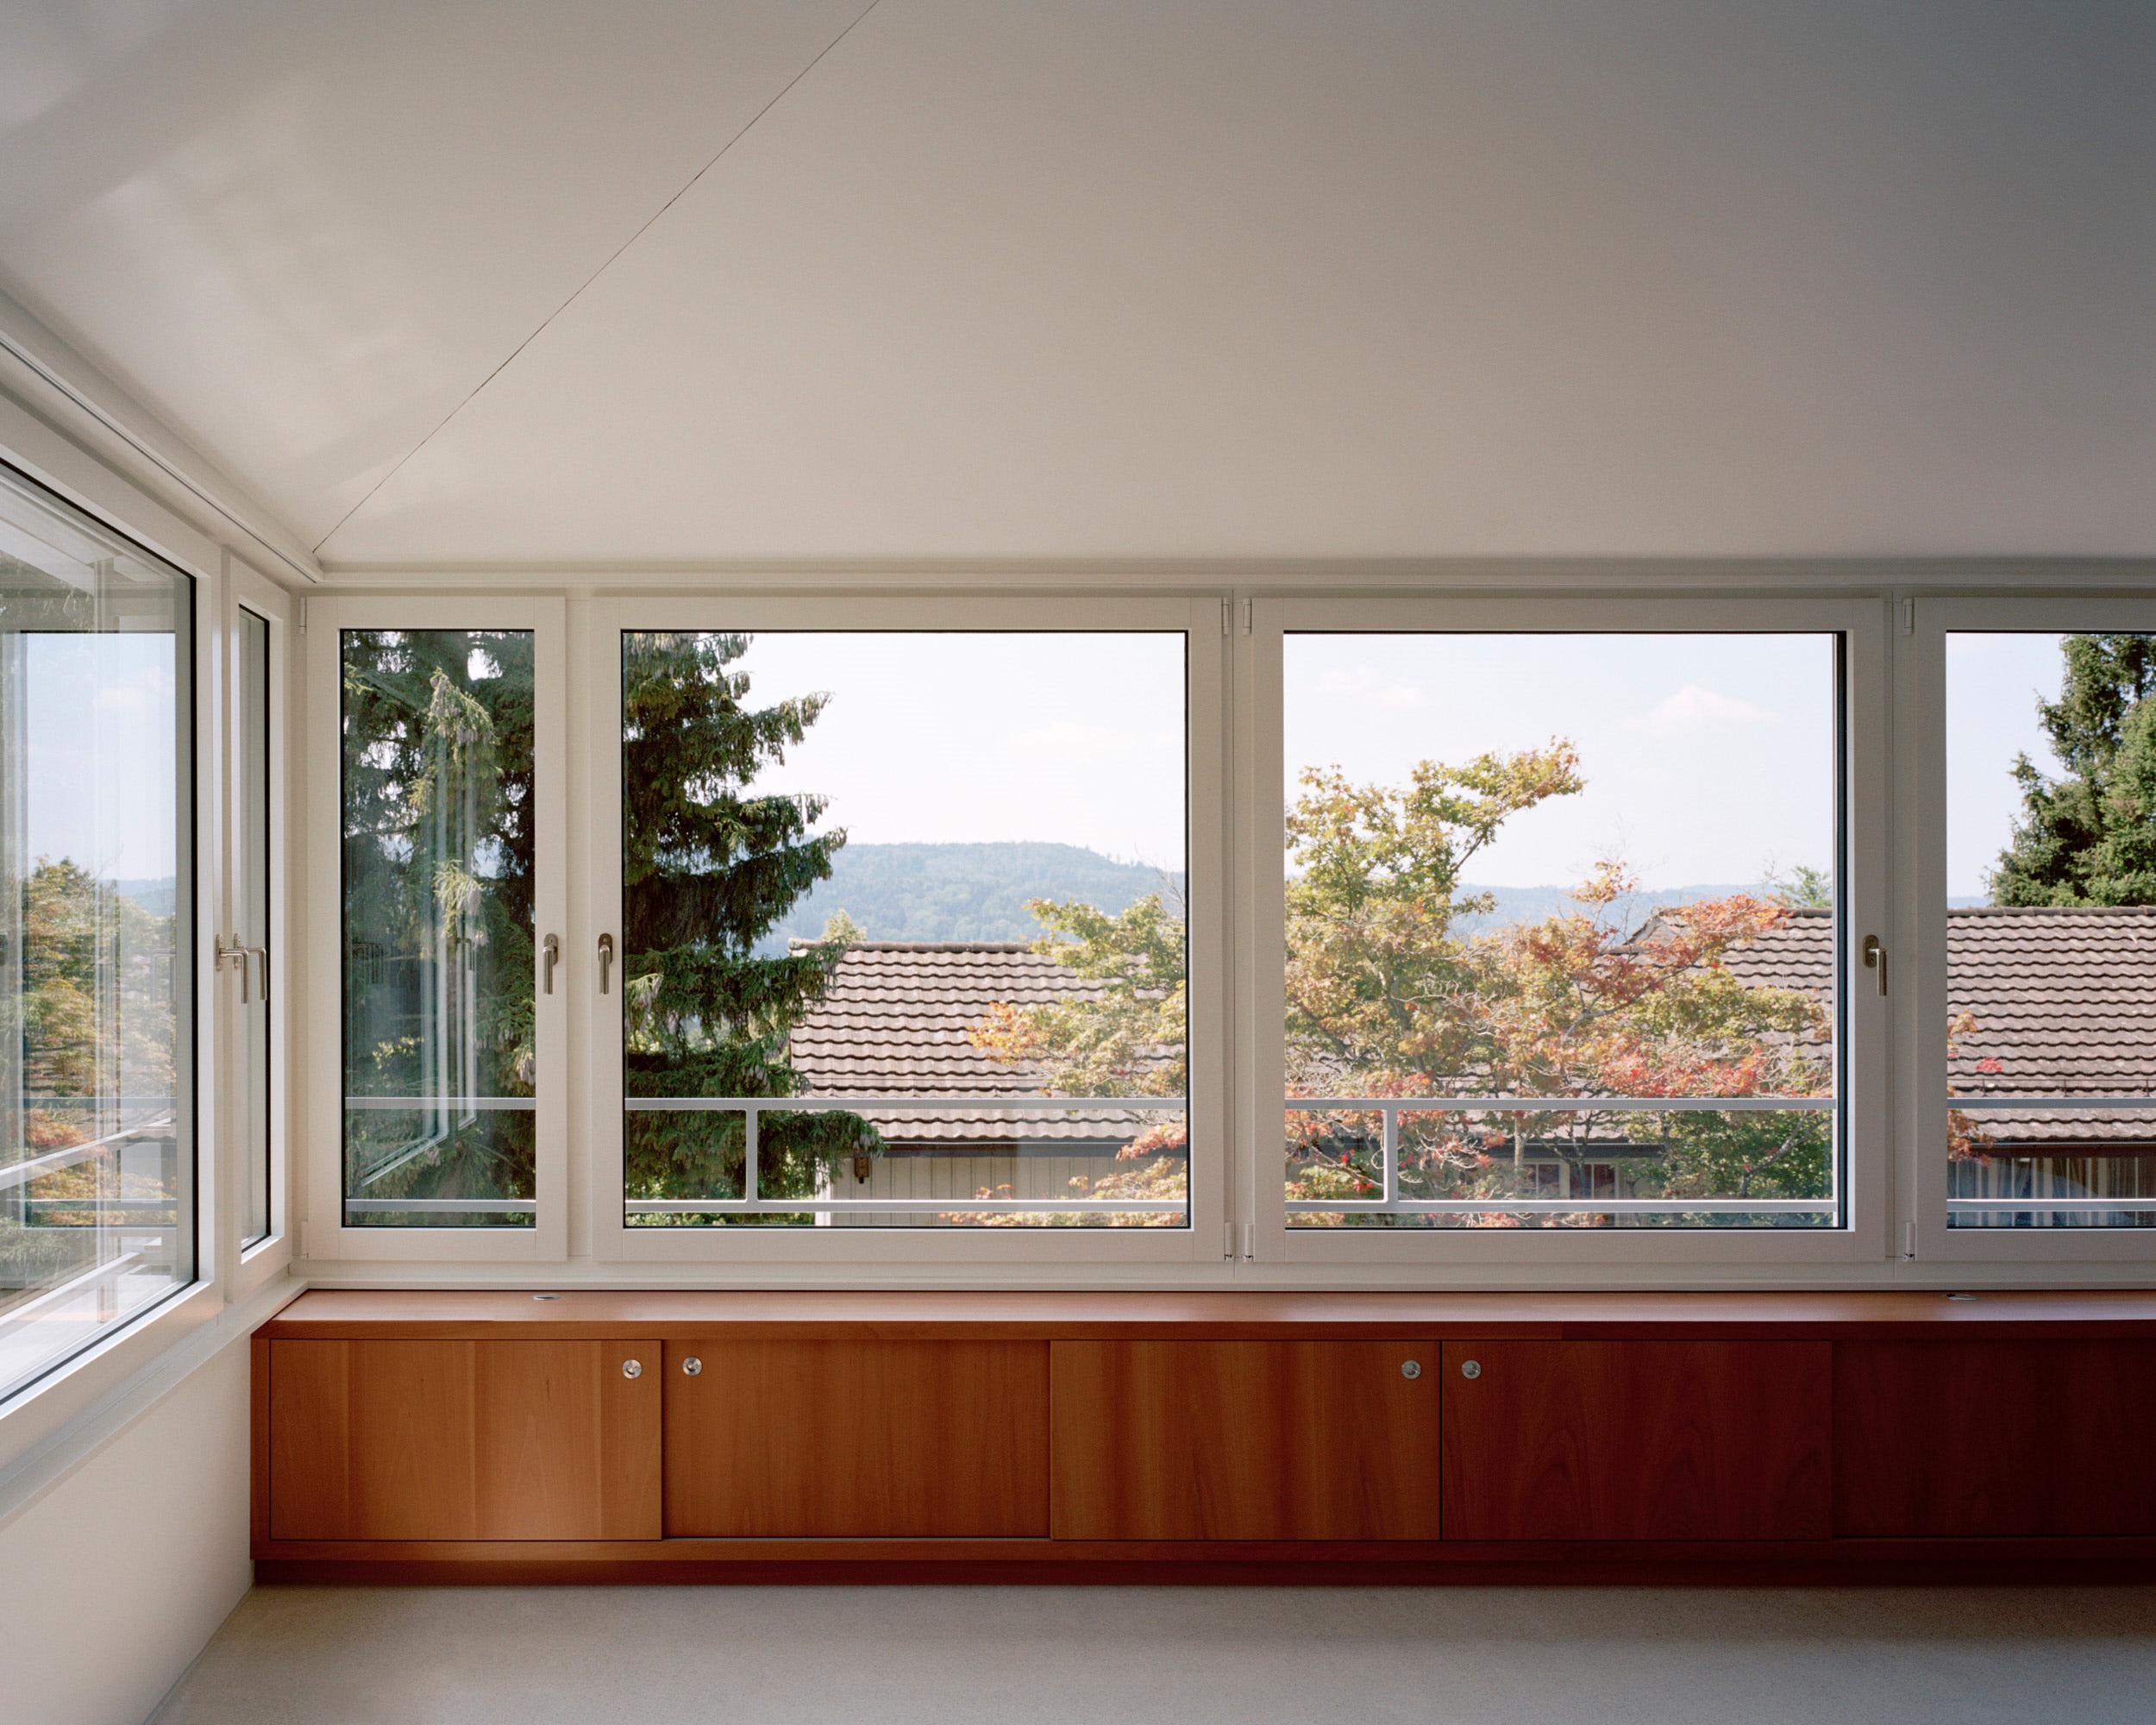 House in Winterthur by Cyrill Dettling Architekturstudio and Schoop de Santis Architekten on Anniversary Magazine